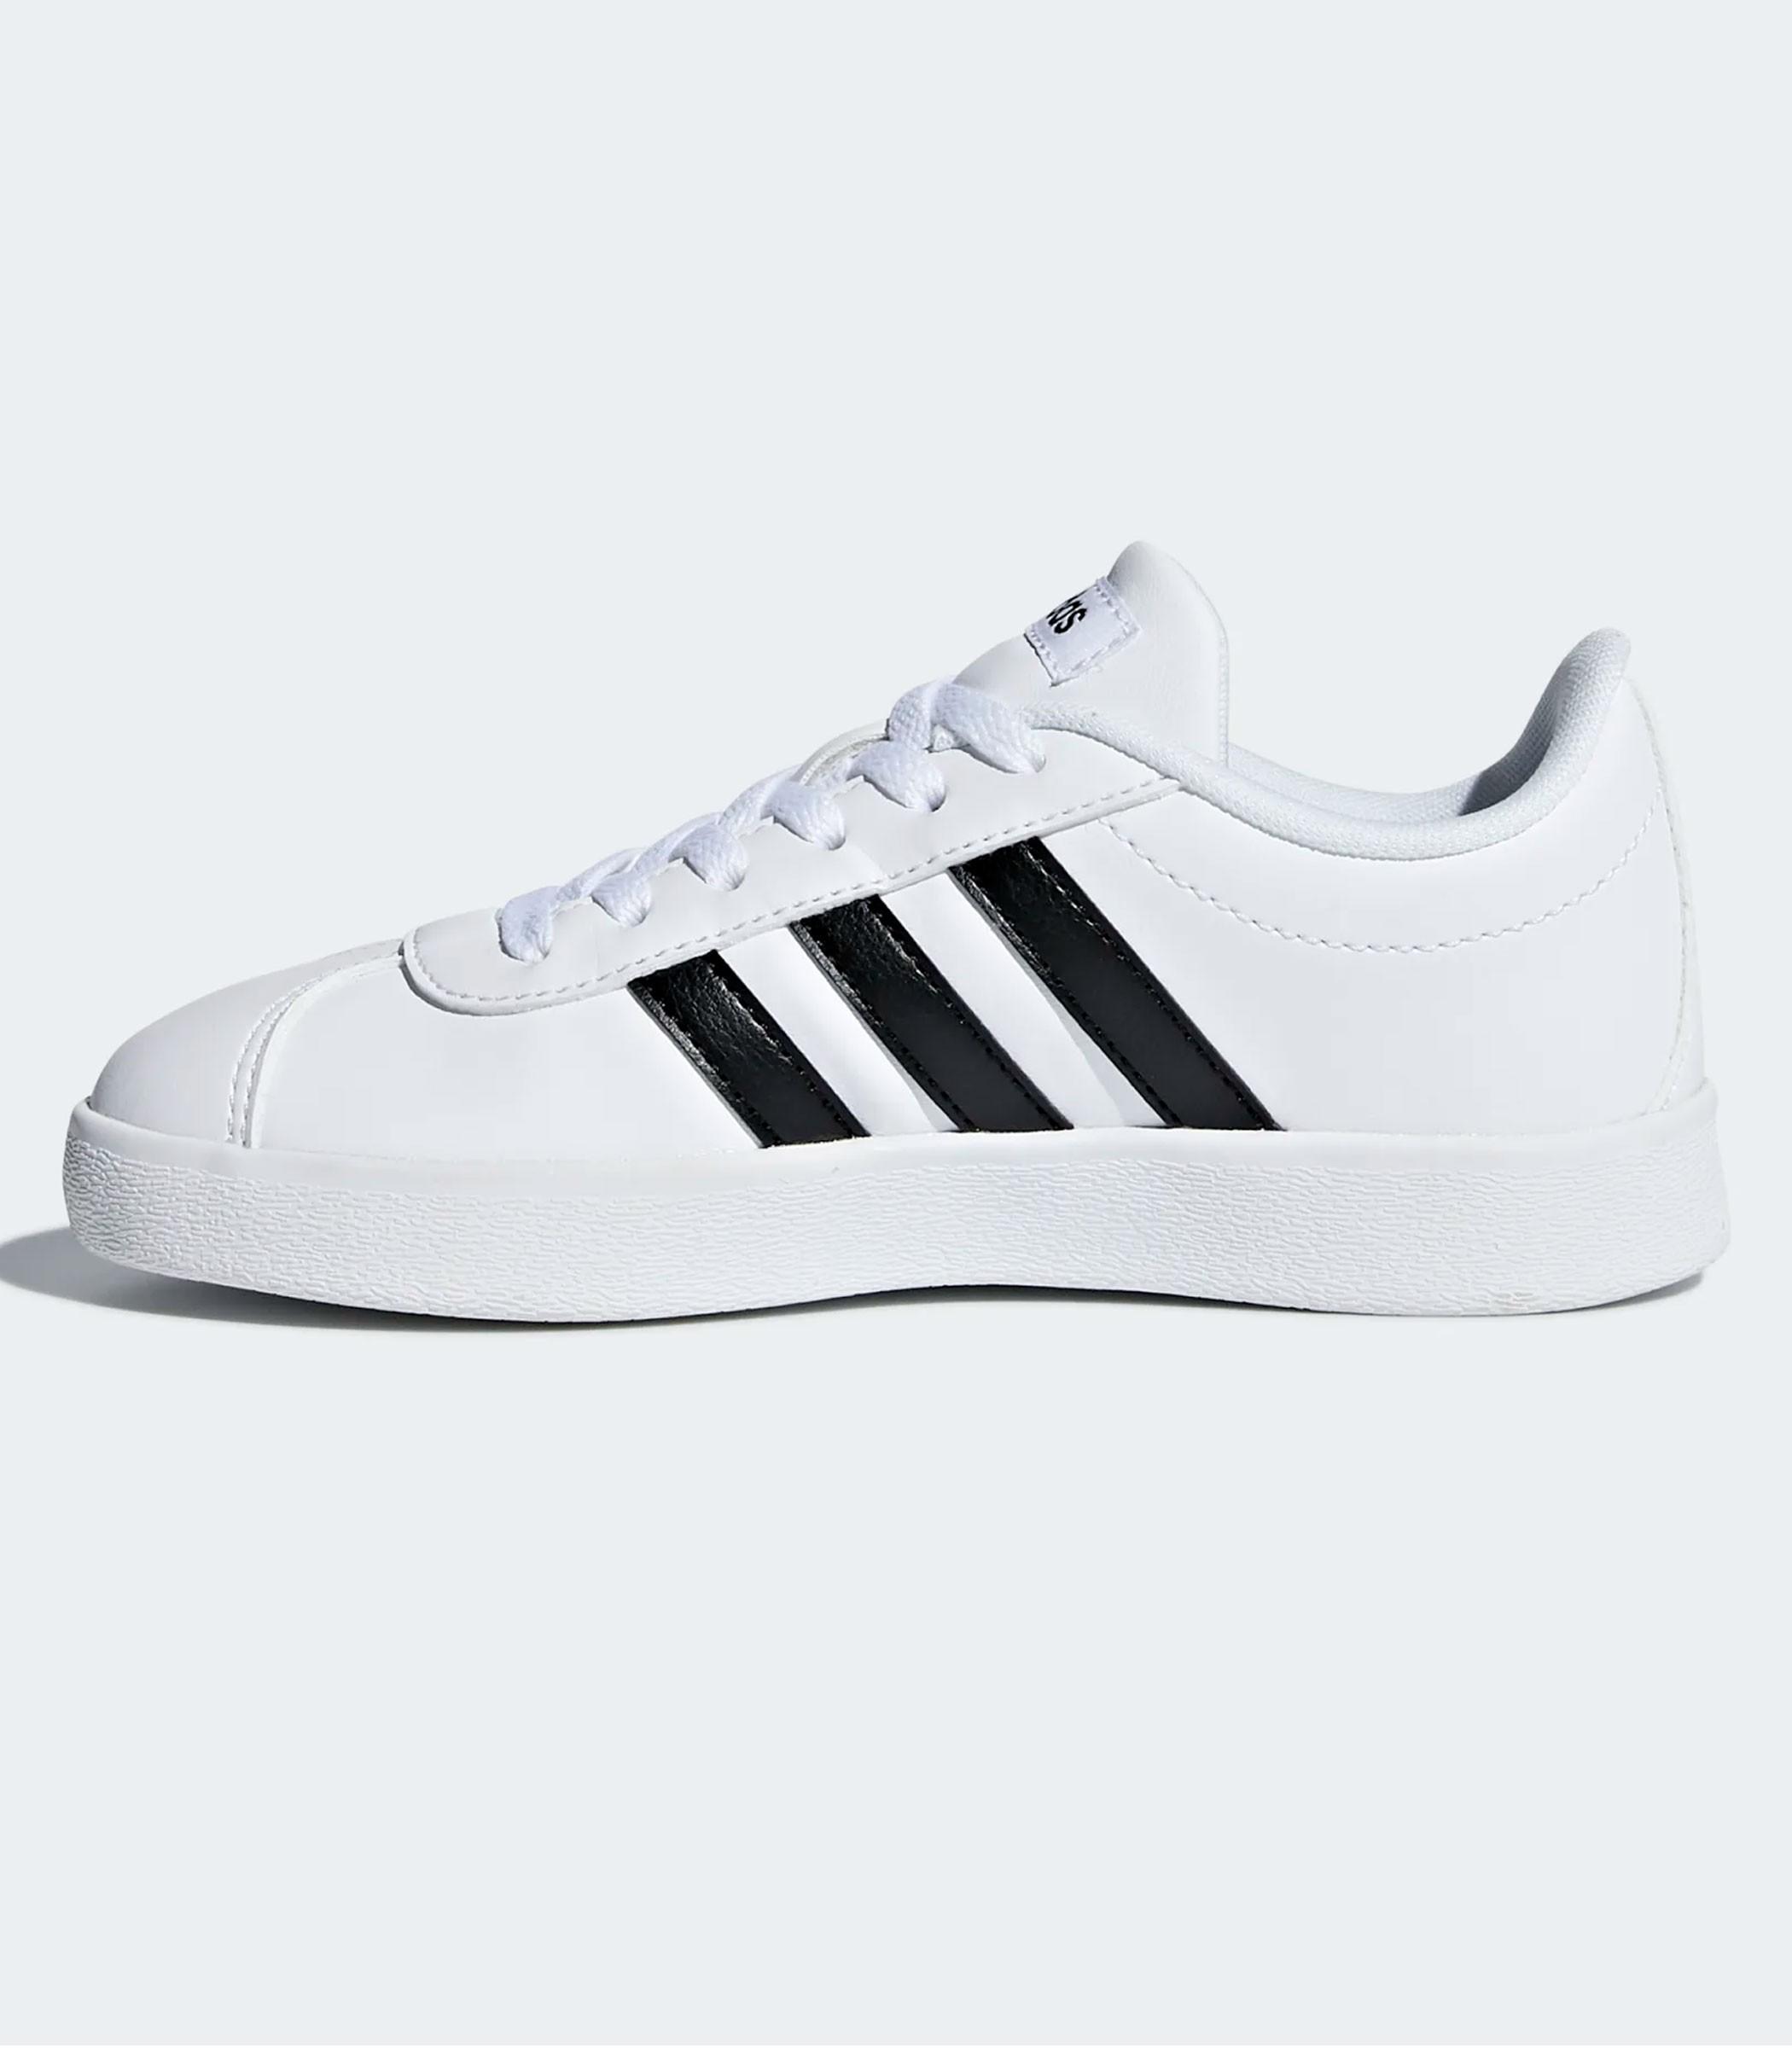 Scarpe Sneakers basse Adidas VL Court 2.0 bianche da bambino